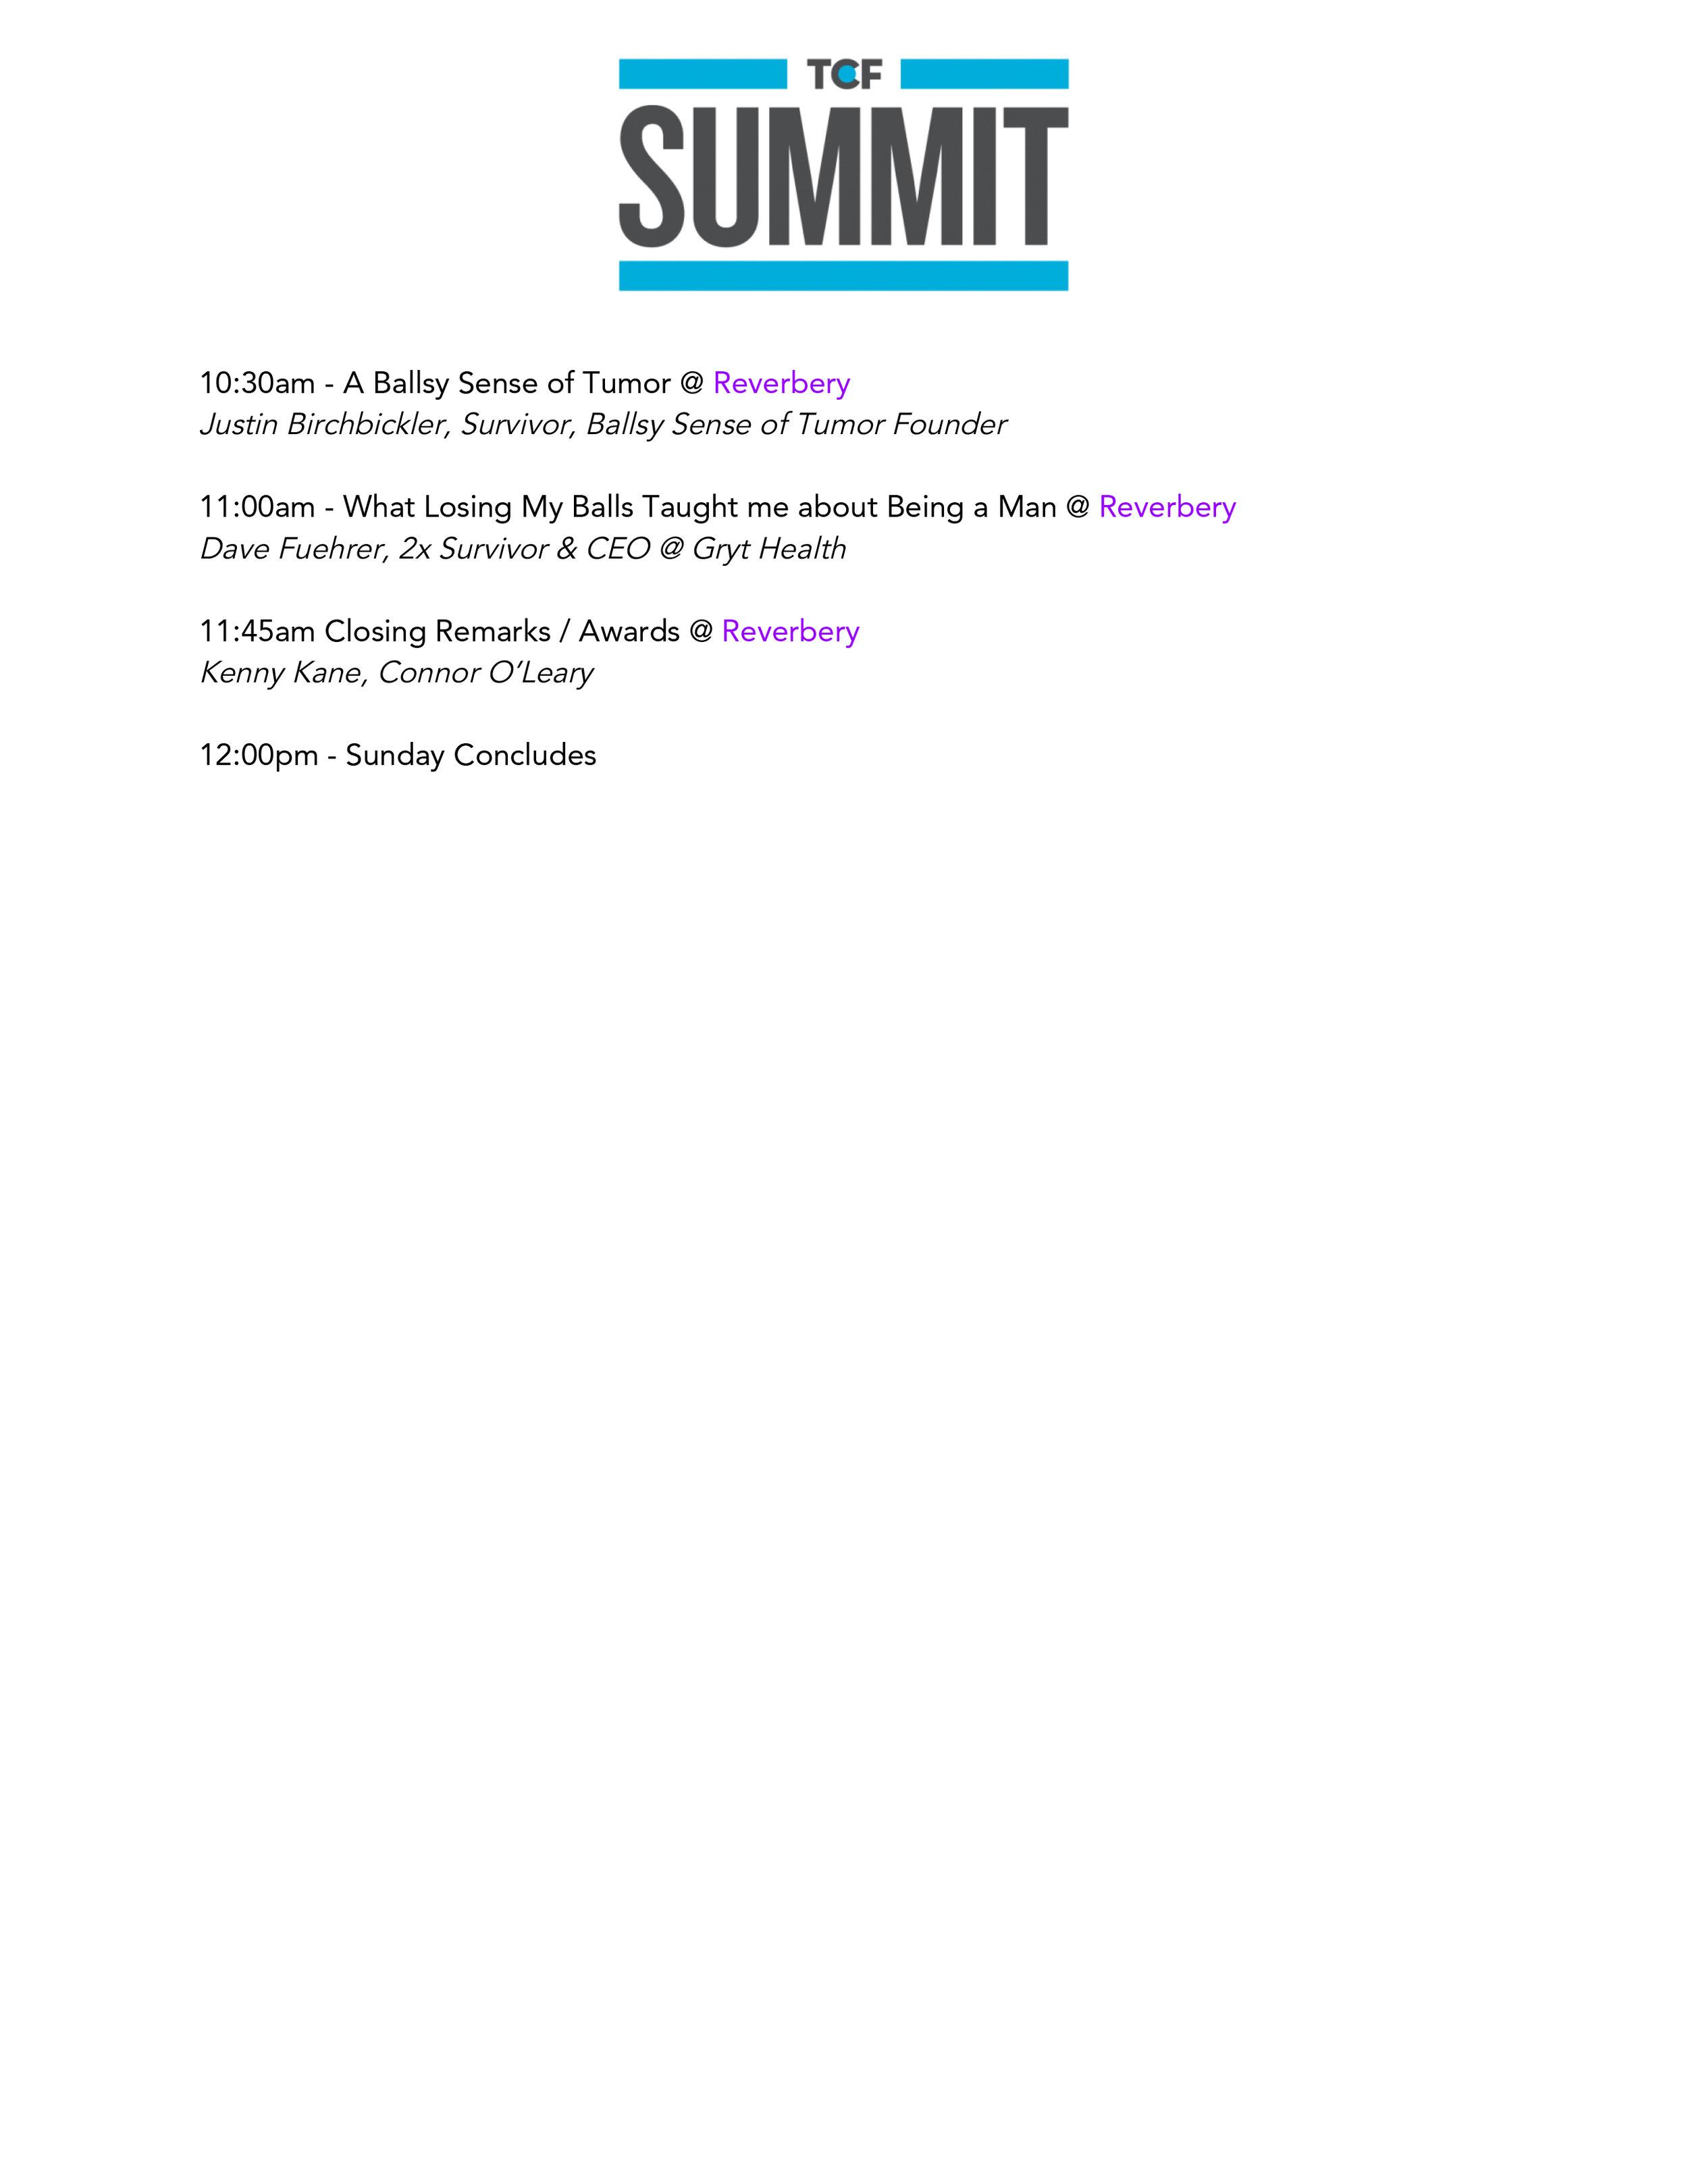 TCF Summit Agenda 2019-3.jpg